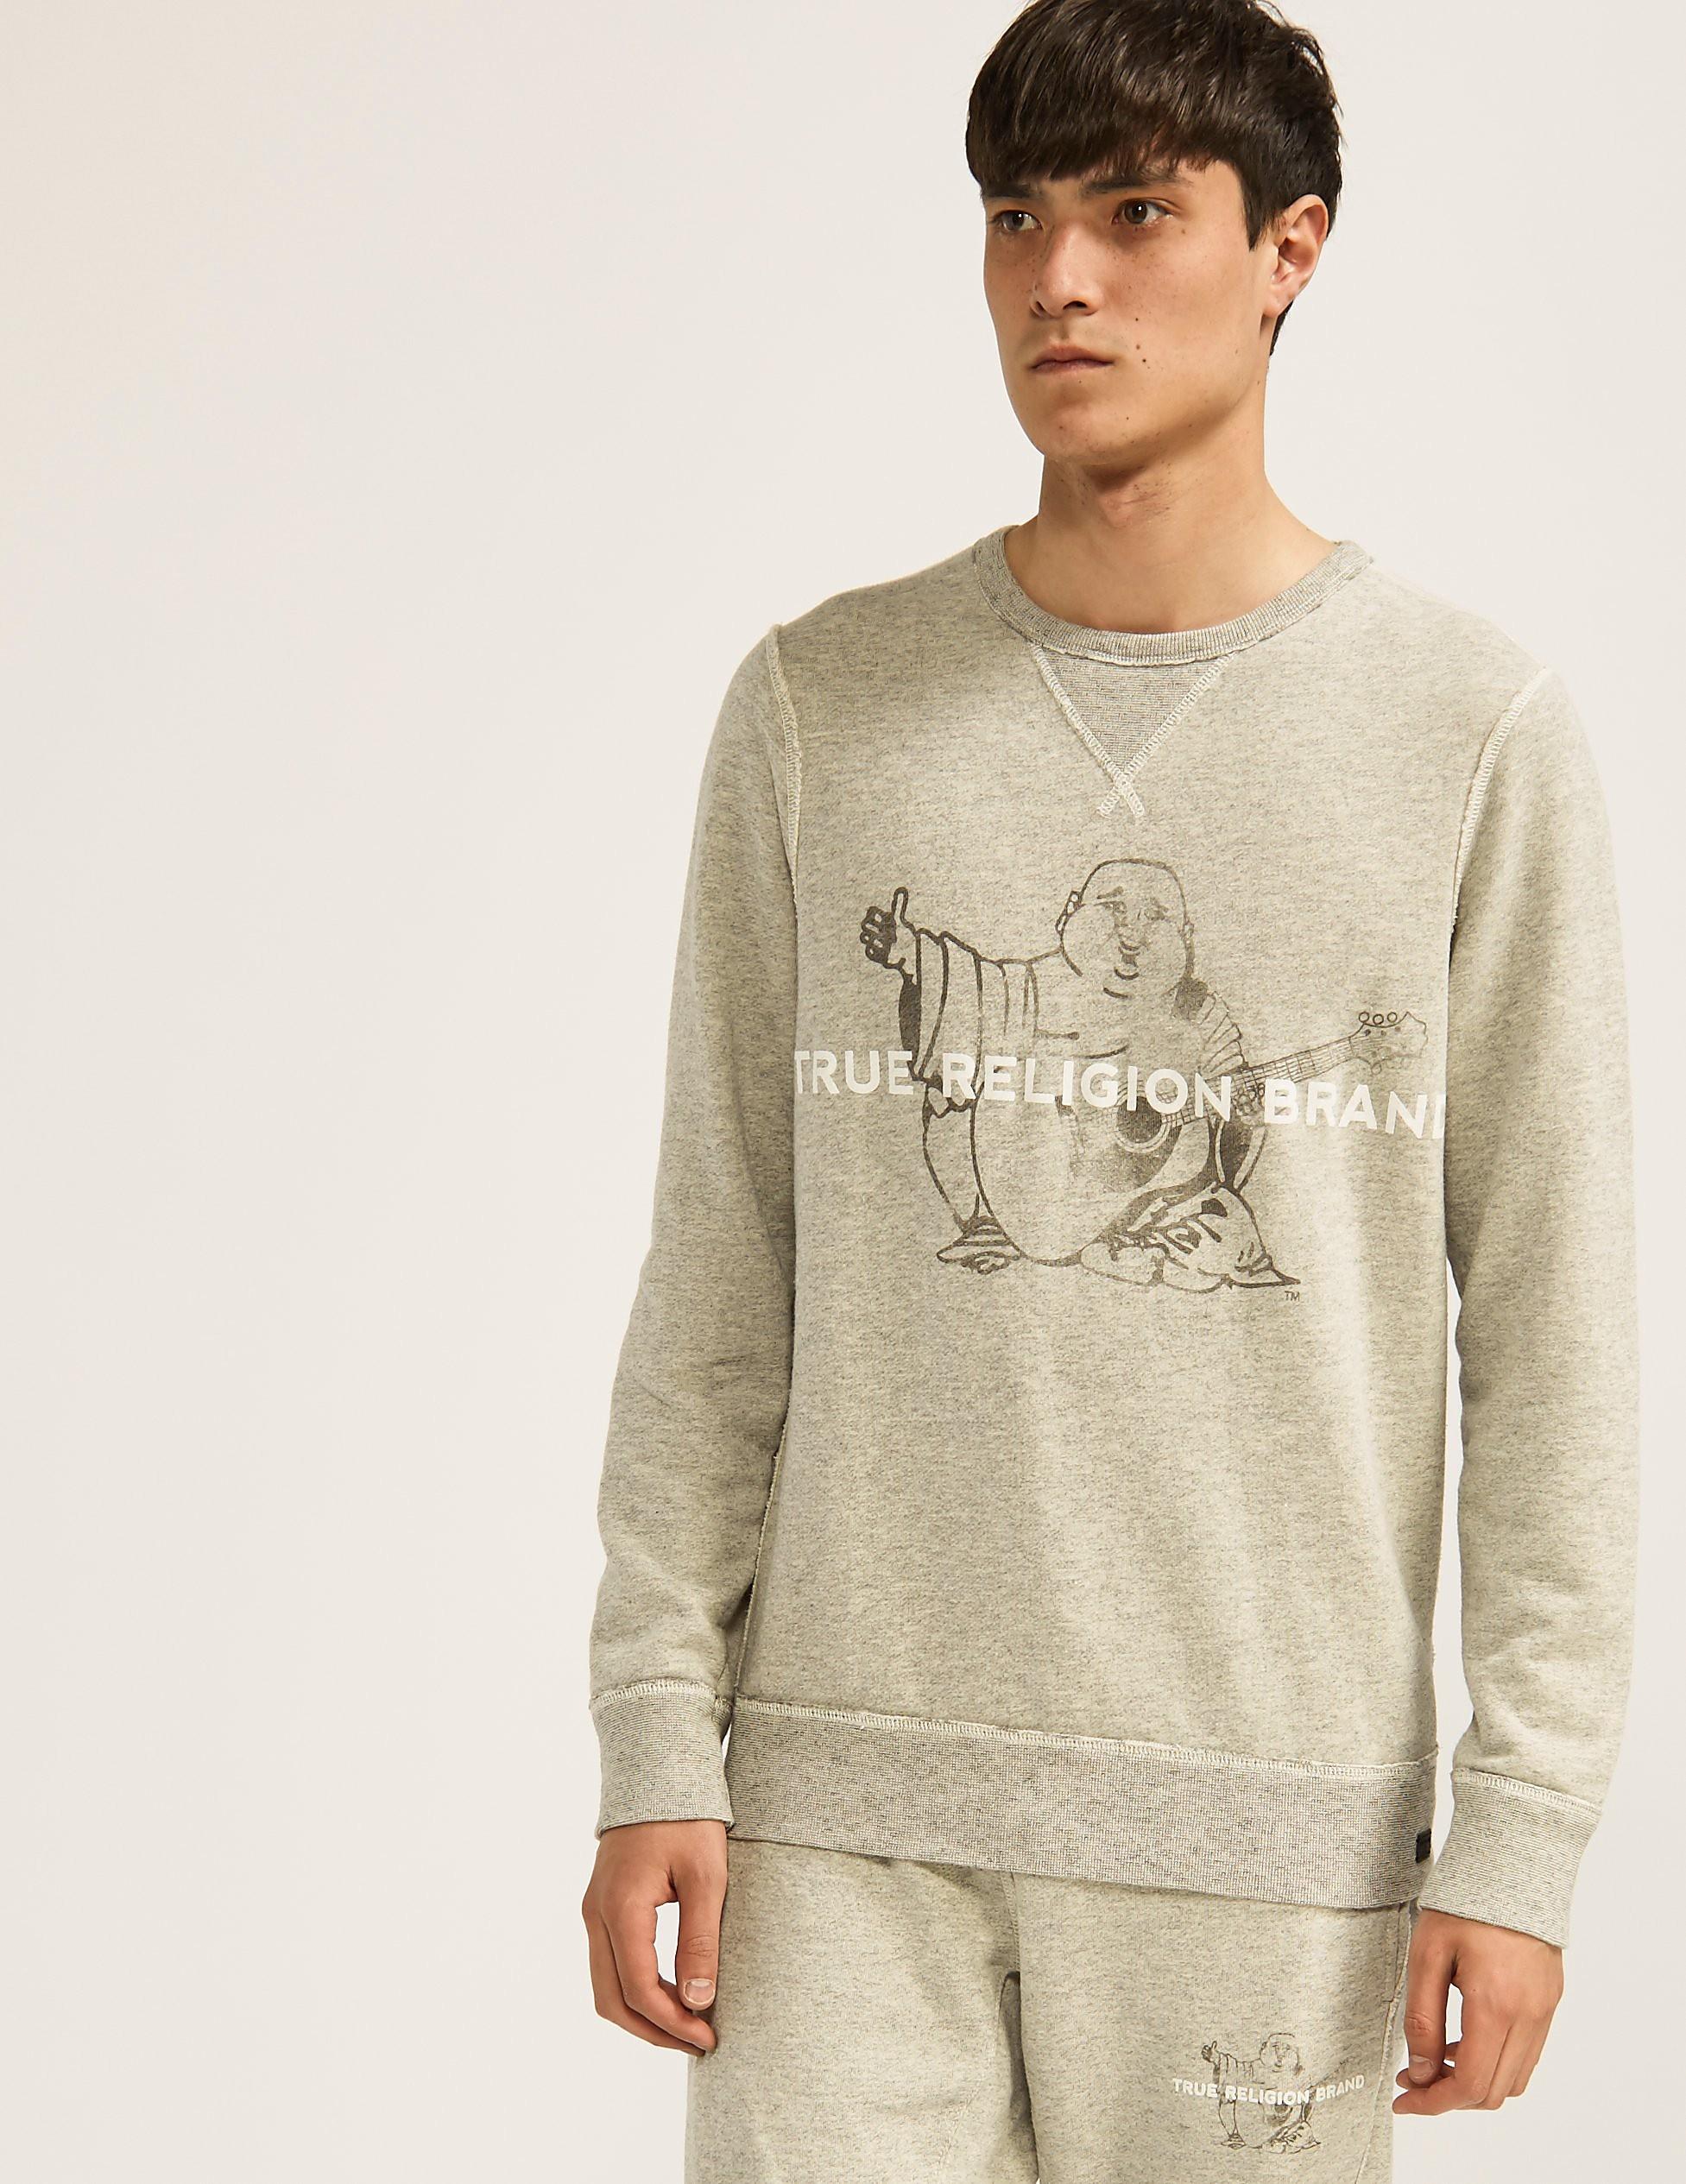 True Religion Buddah Crew Sweatshirt